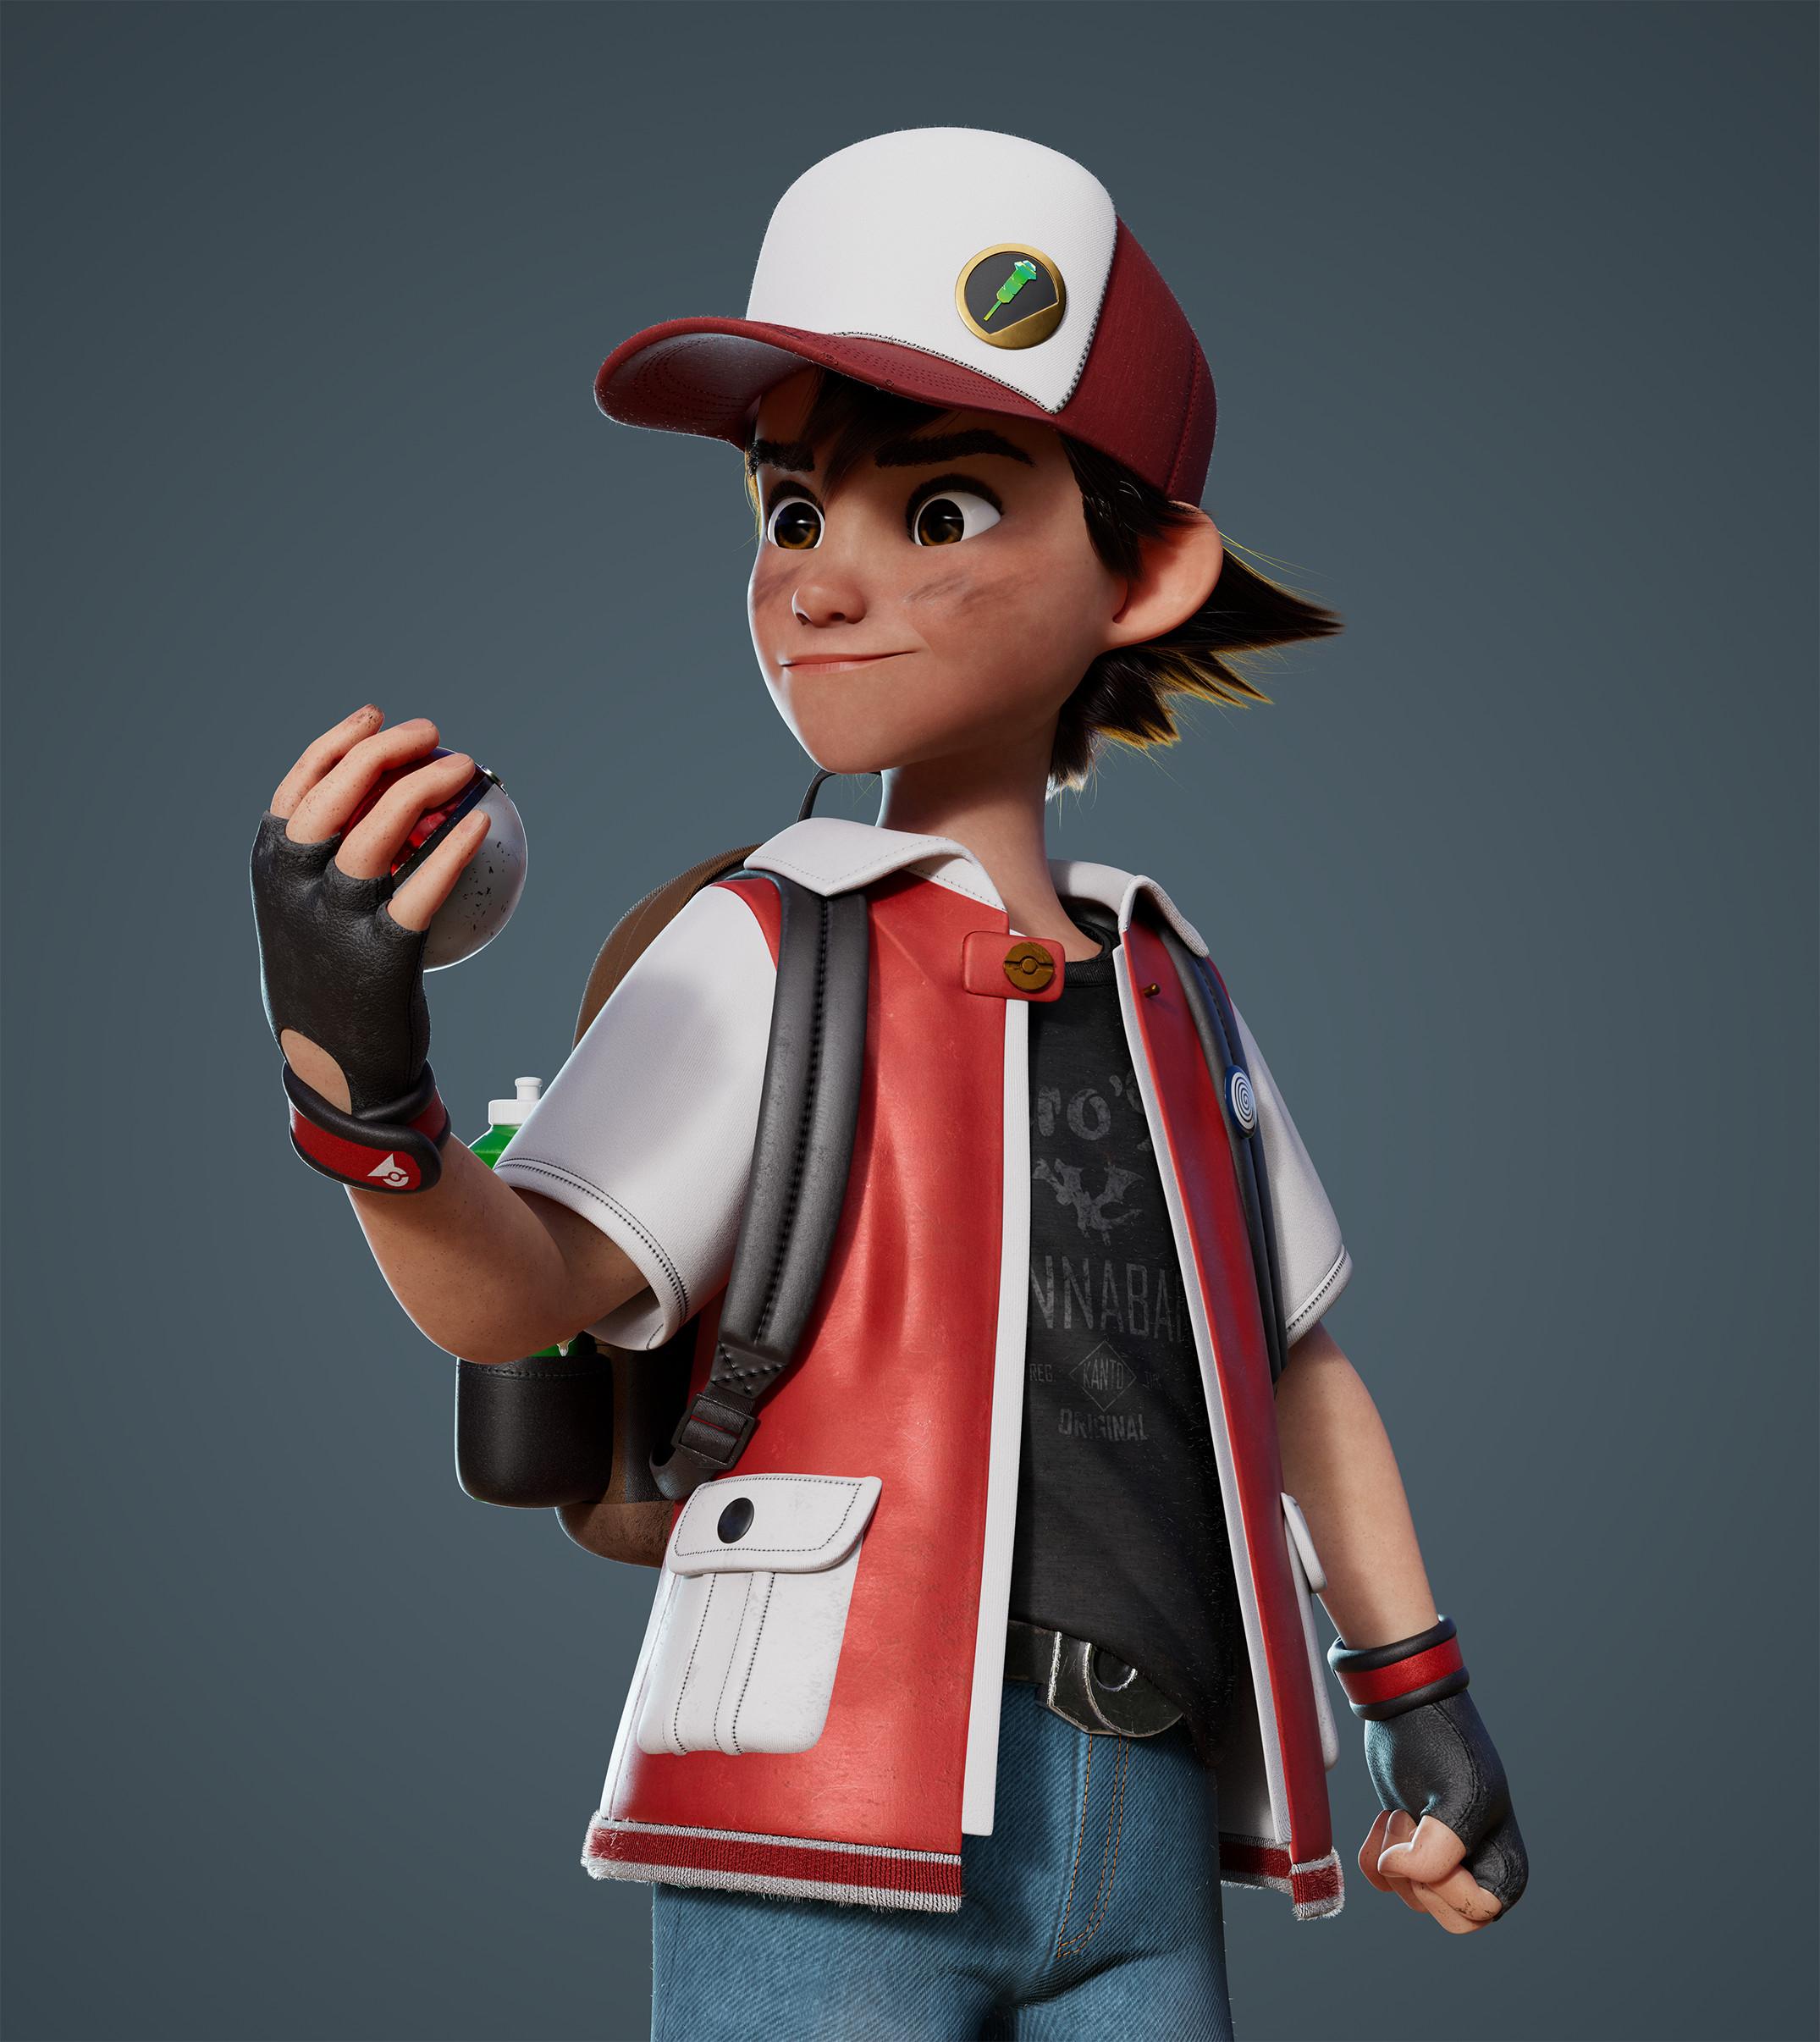 [Nintendo] L'univers Pokémon - Page 16 Spenser-morgan-pokemontrainerred-closeupartstation